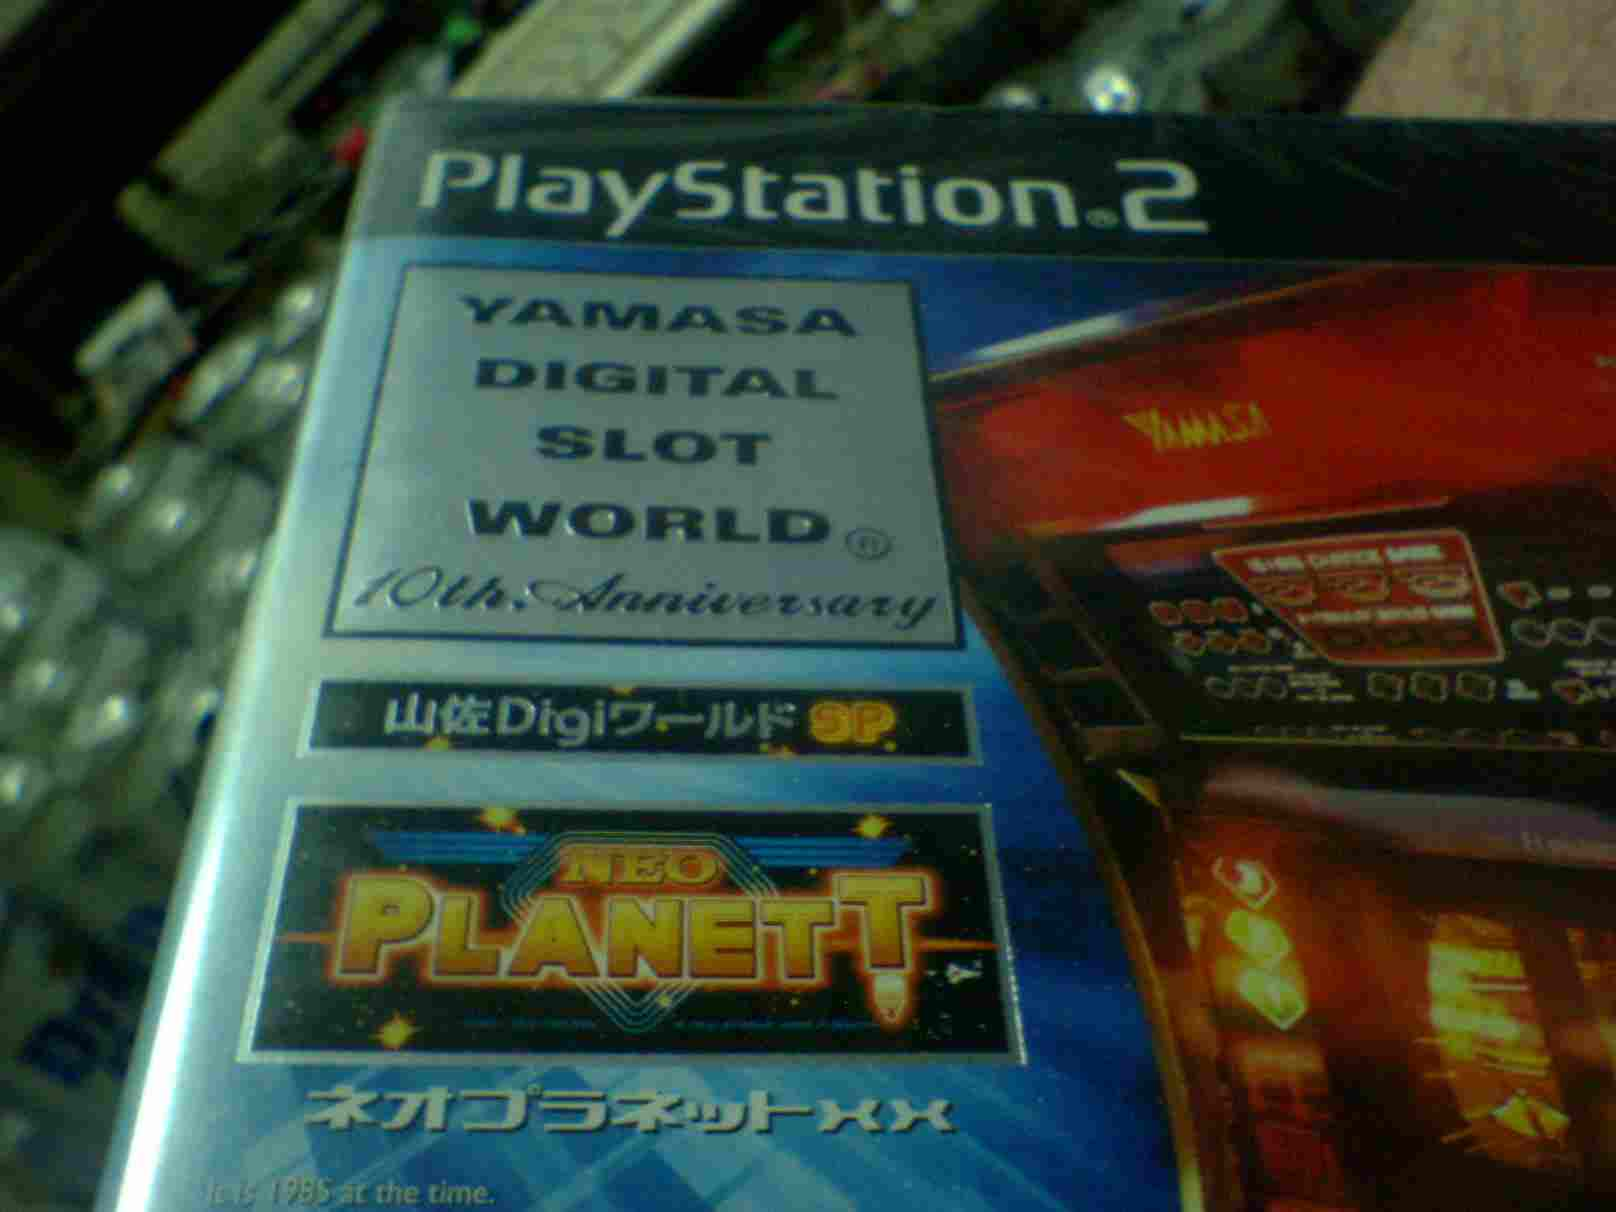 Play Station2用ネオプラネット